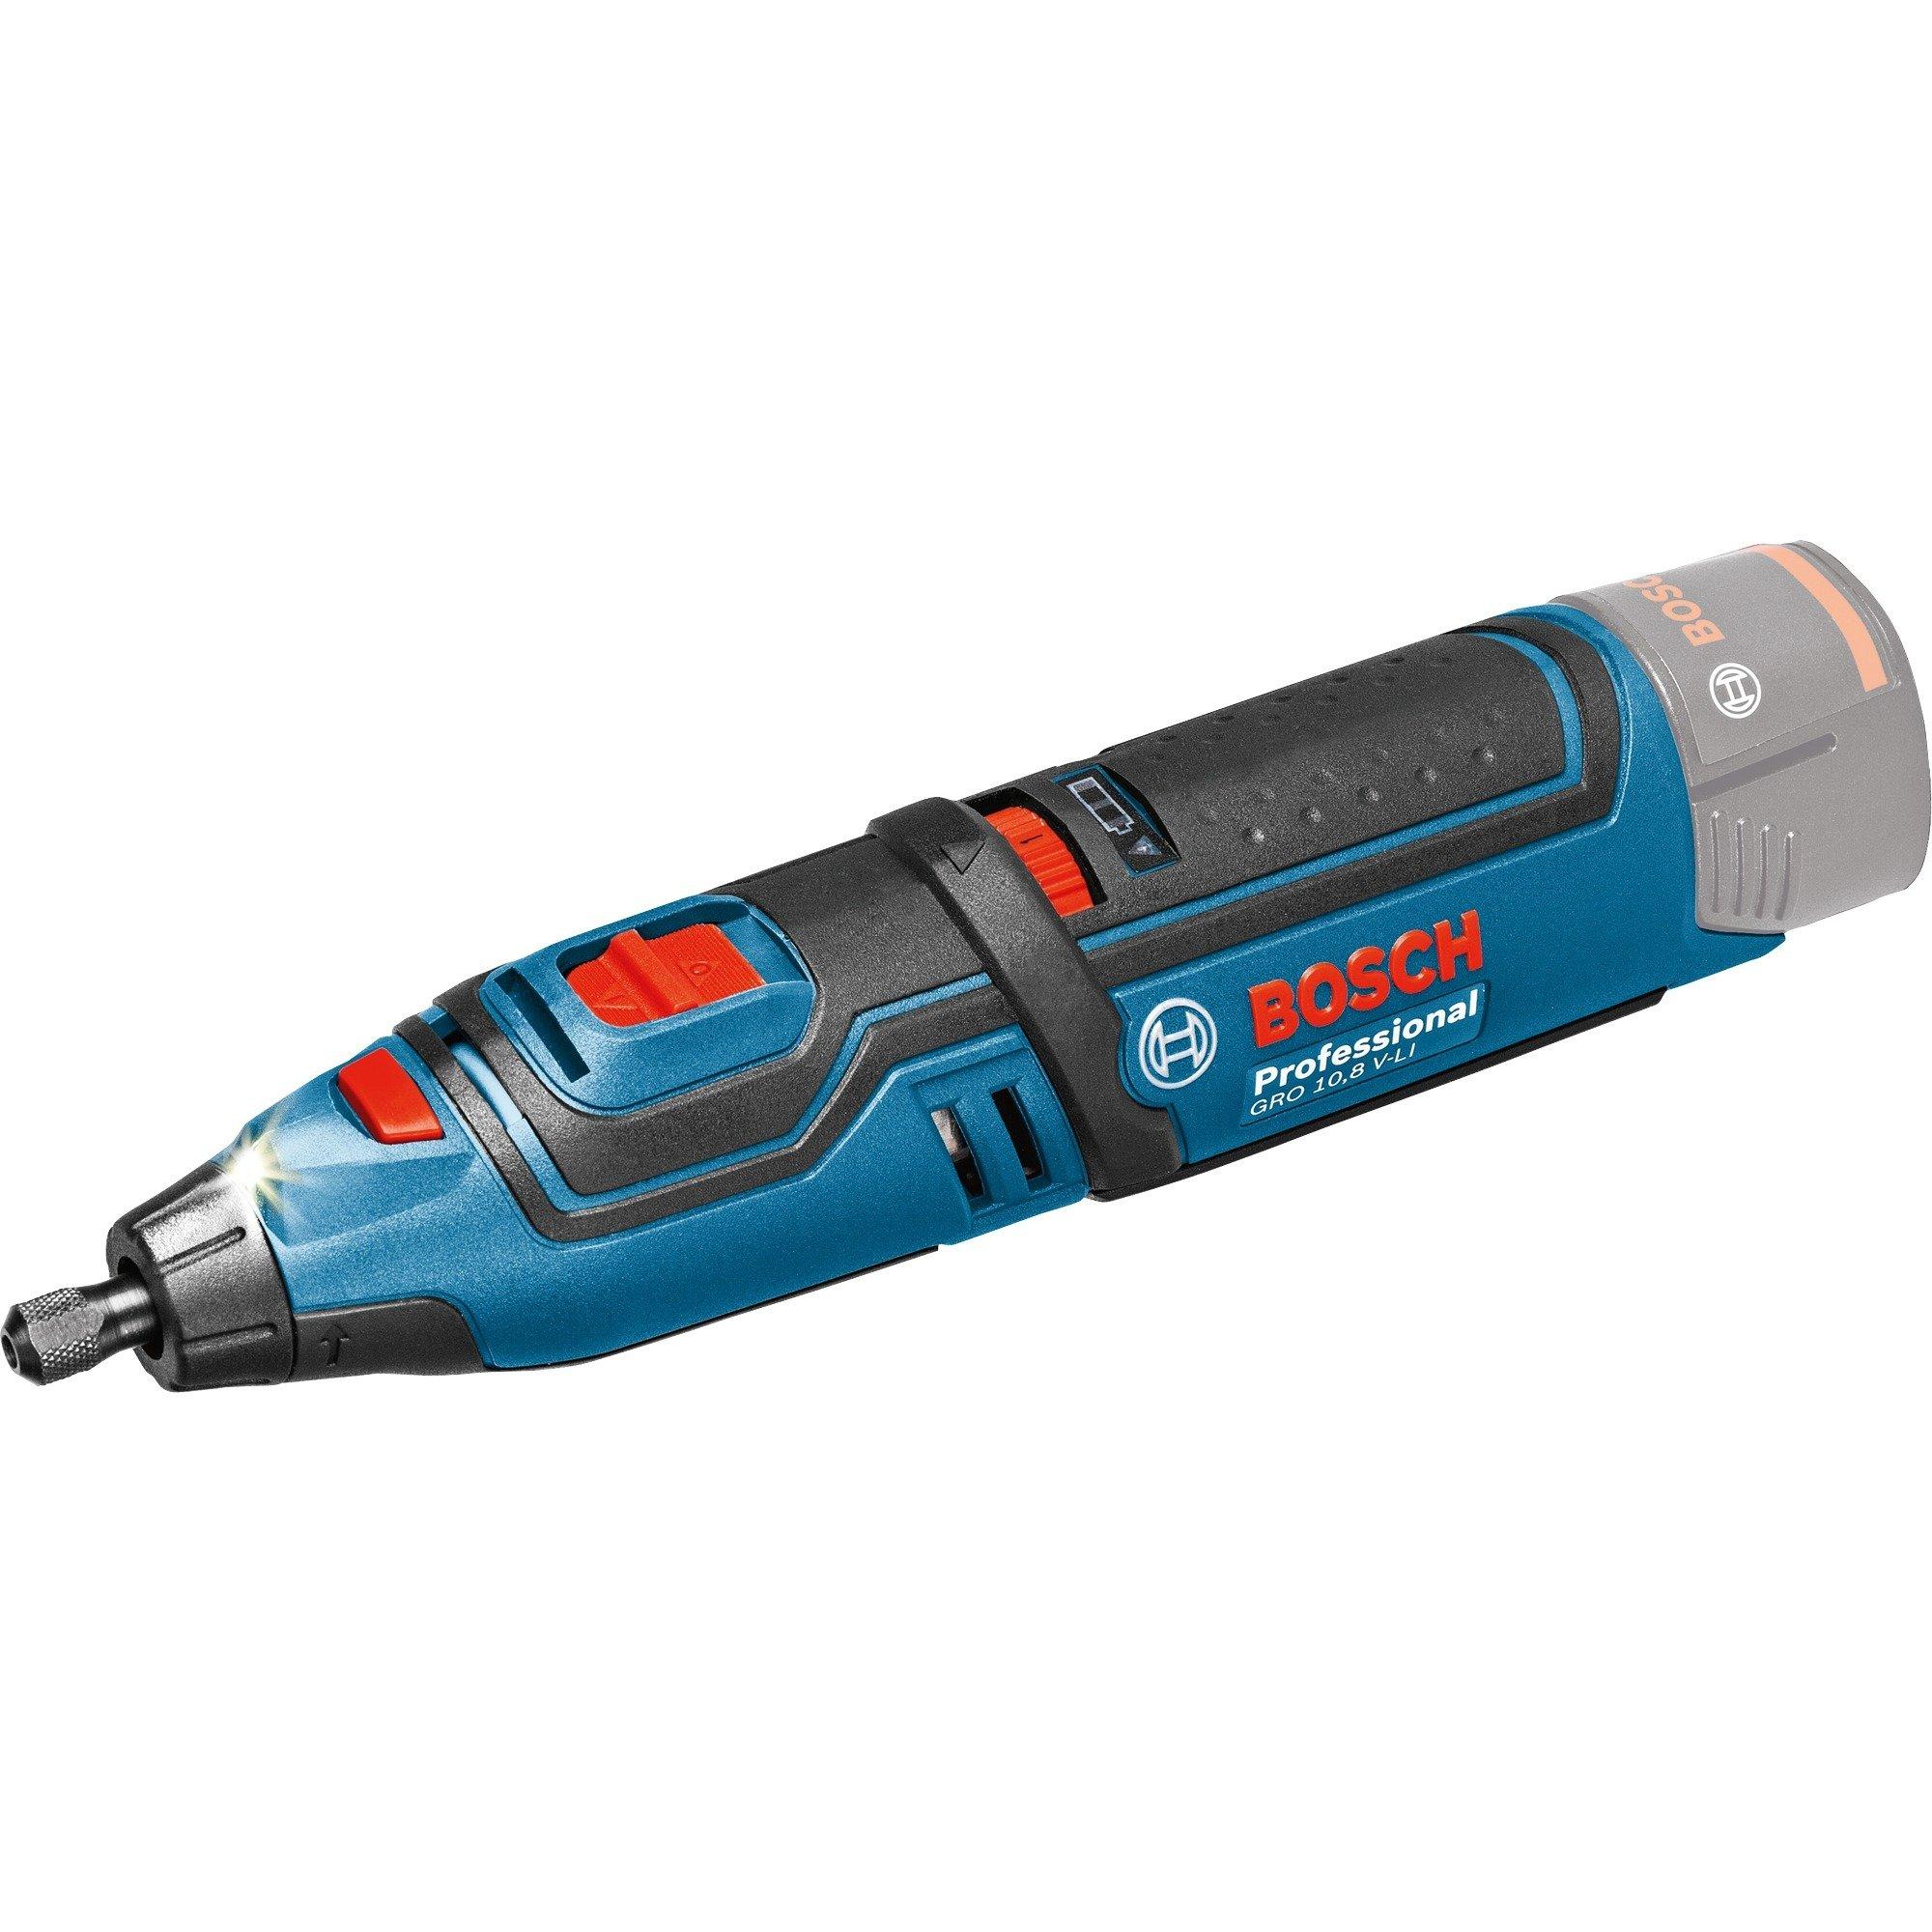 Akku Rotationswerkzeug GRO 12V 35 solo Professional, 12 Volt, Multifunktions Werkzeug (blauschwarz, ohne Akku und Ladegerät)